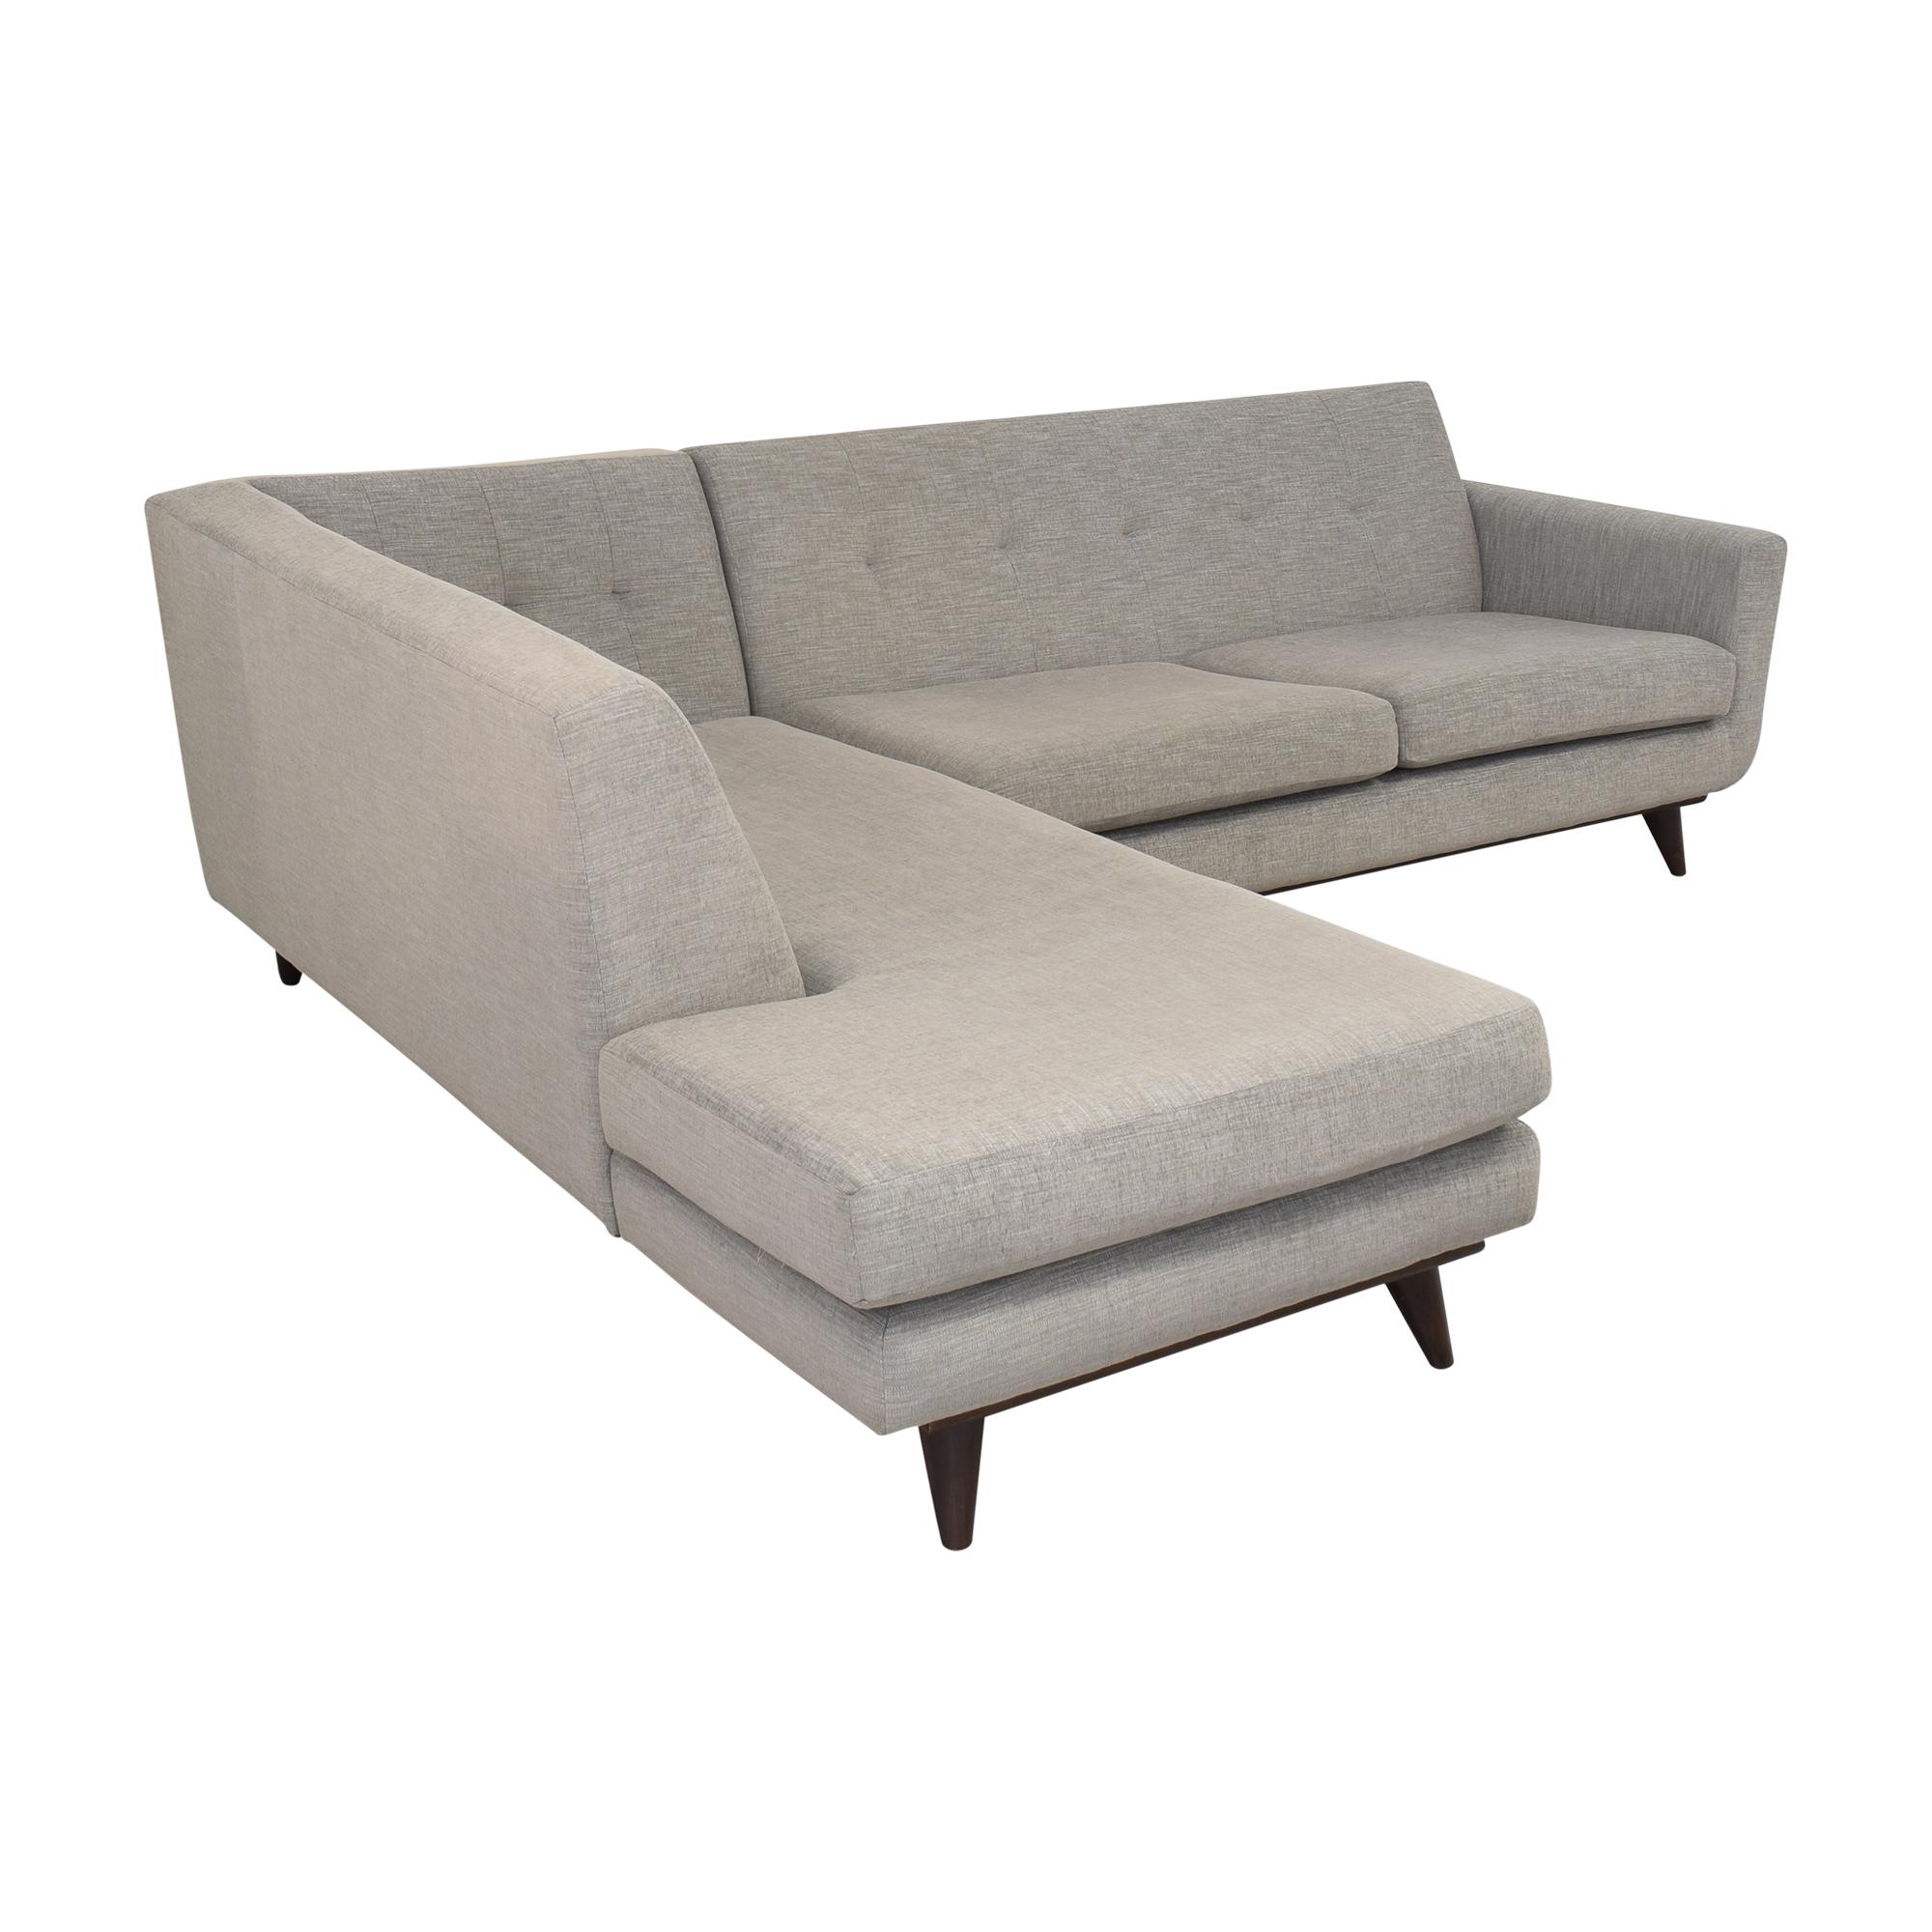 Joybird Joybird Hughes Sectional Sofa with Bumper Sectionals